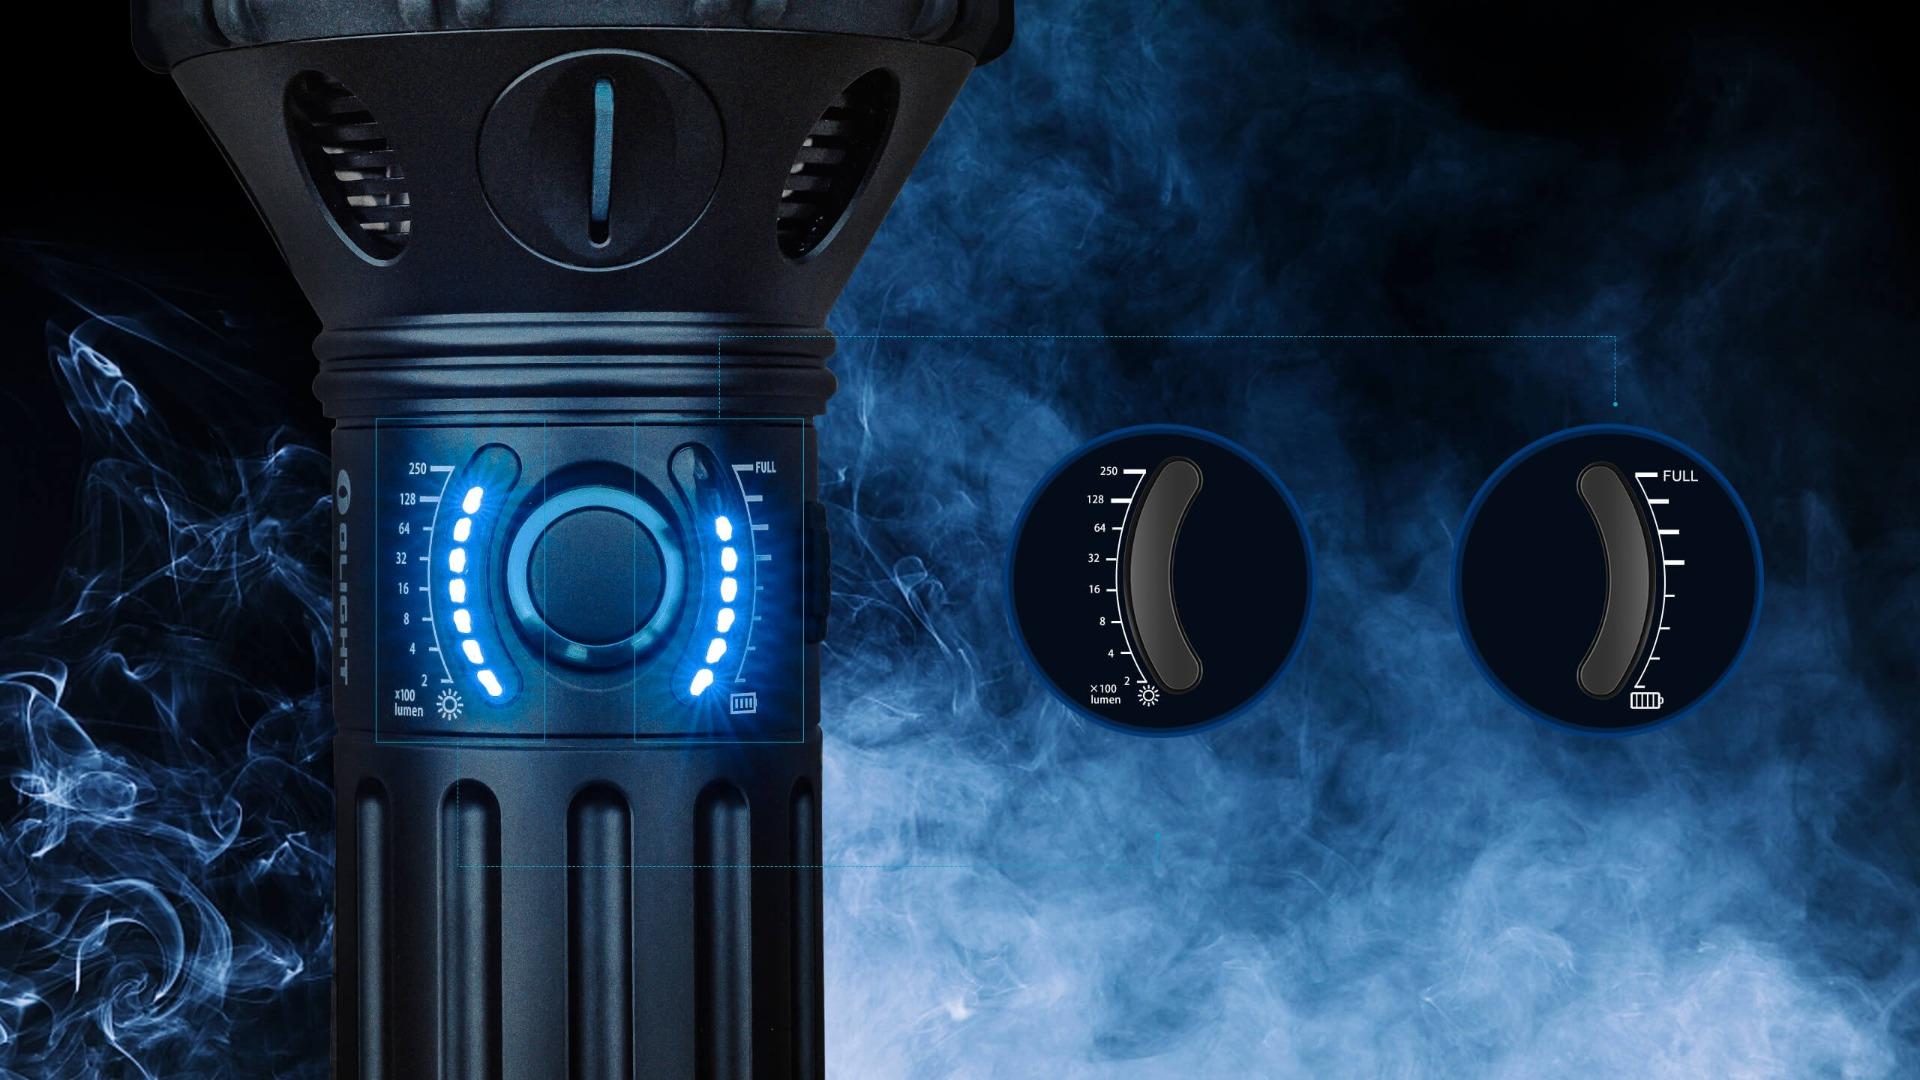 led taschenlampe x9r akku indicator